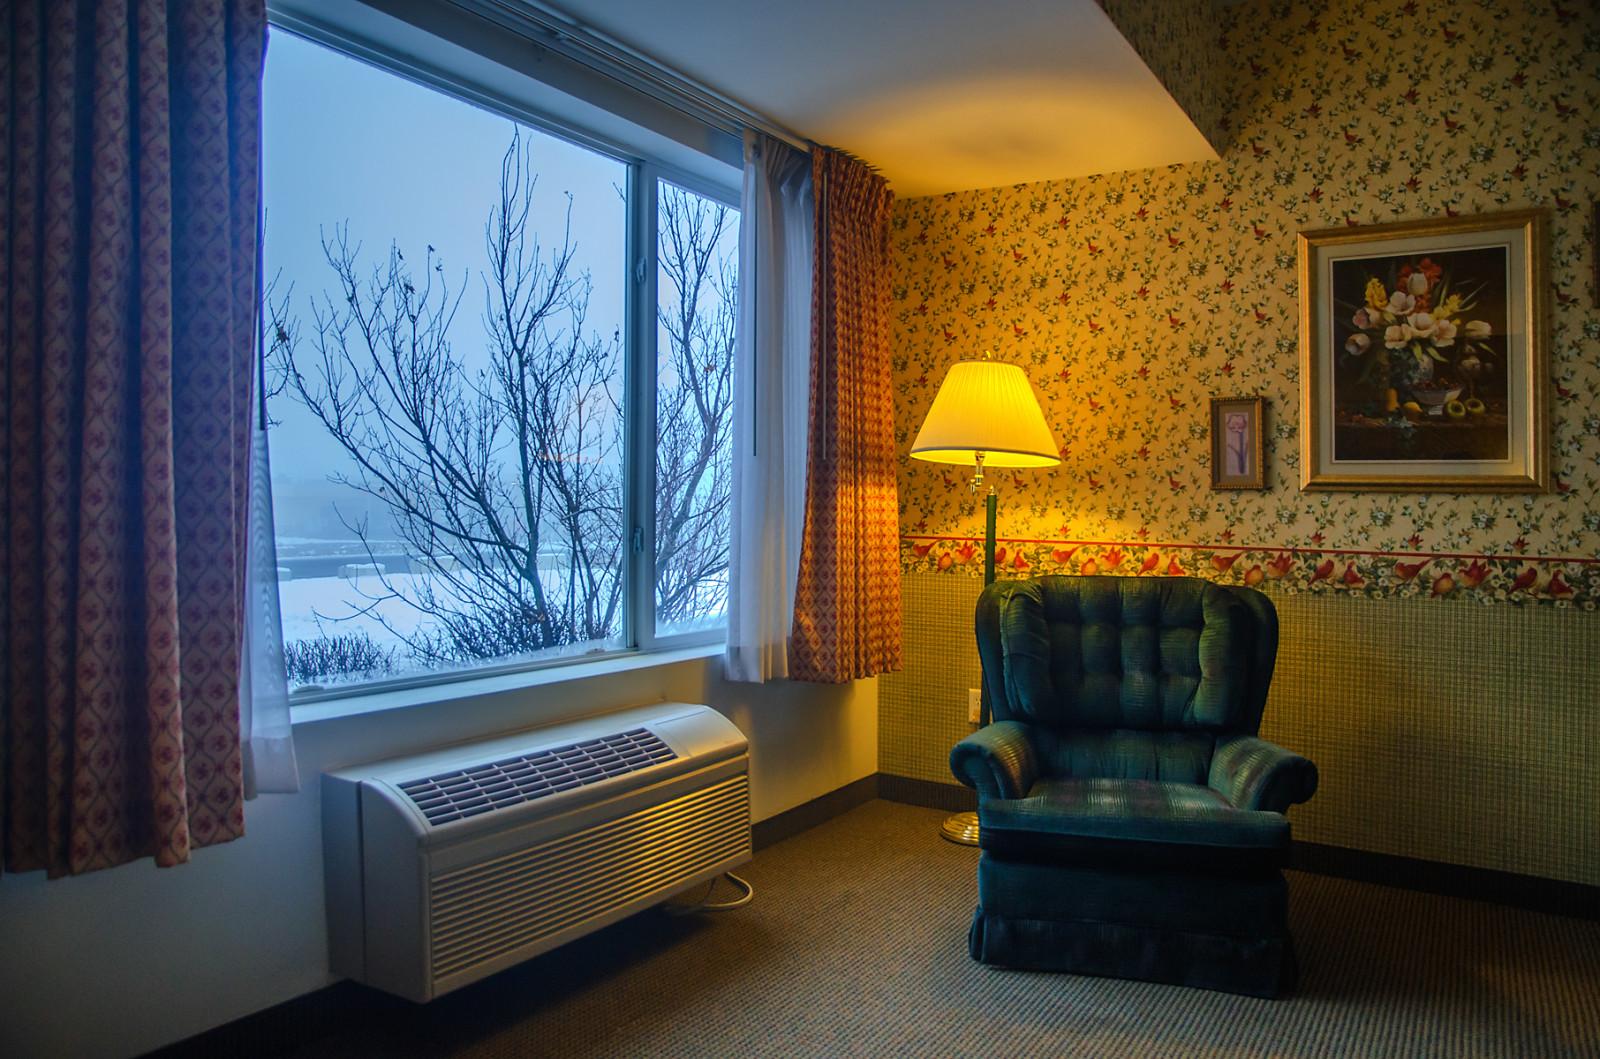 Papel De Parede Quarto Design De Interiores Casa Parede Teto  -> Cortina Sala Apartamento